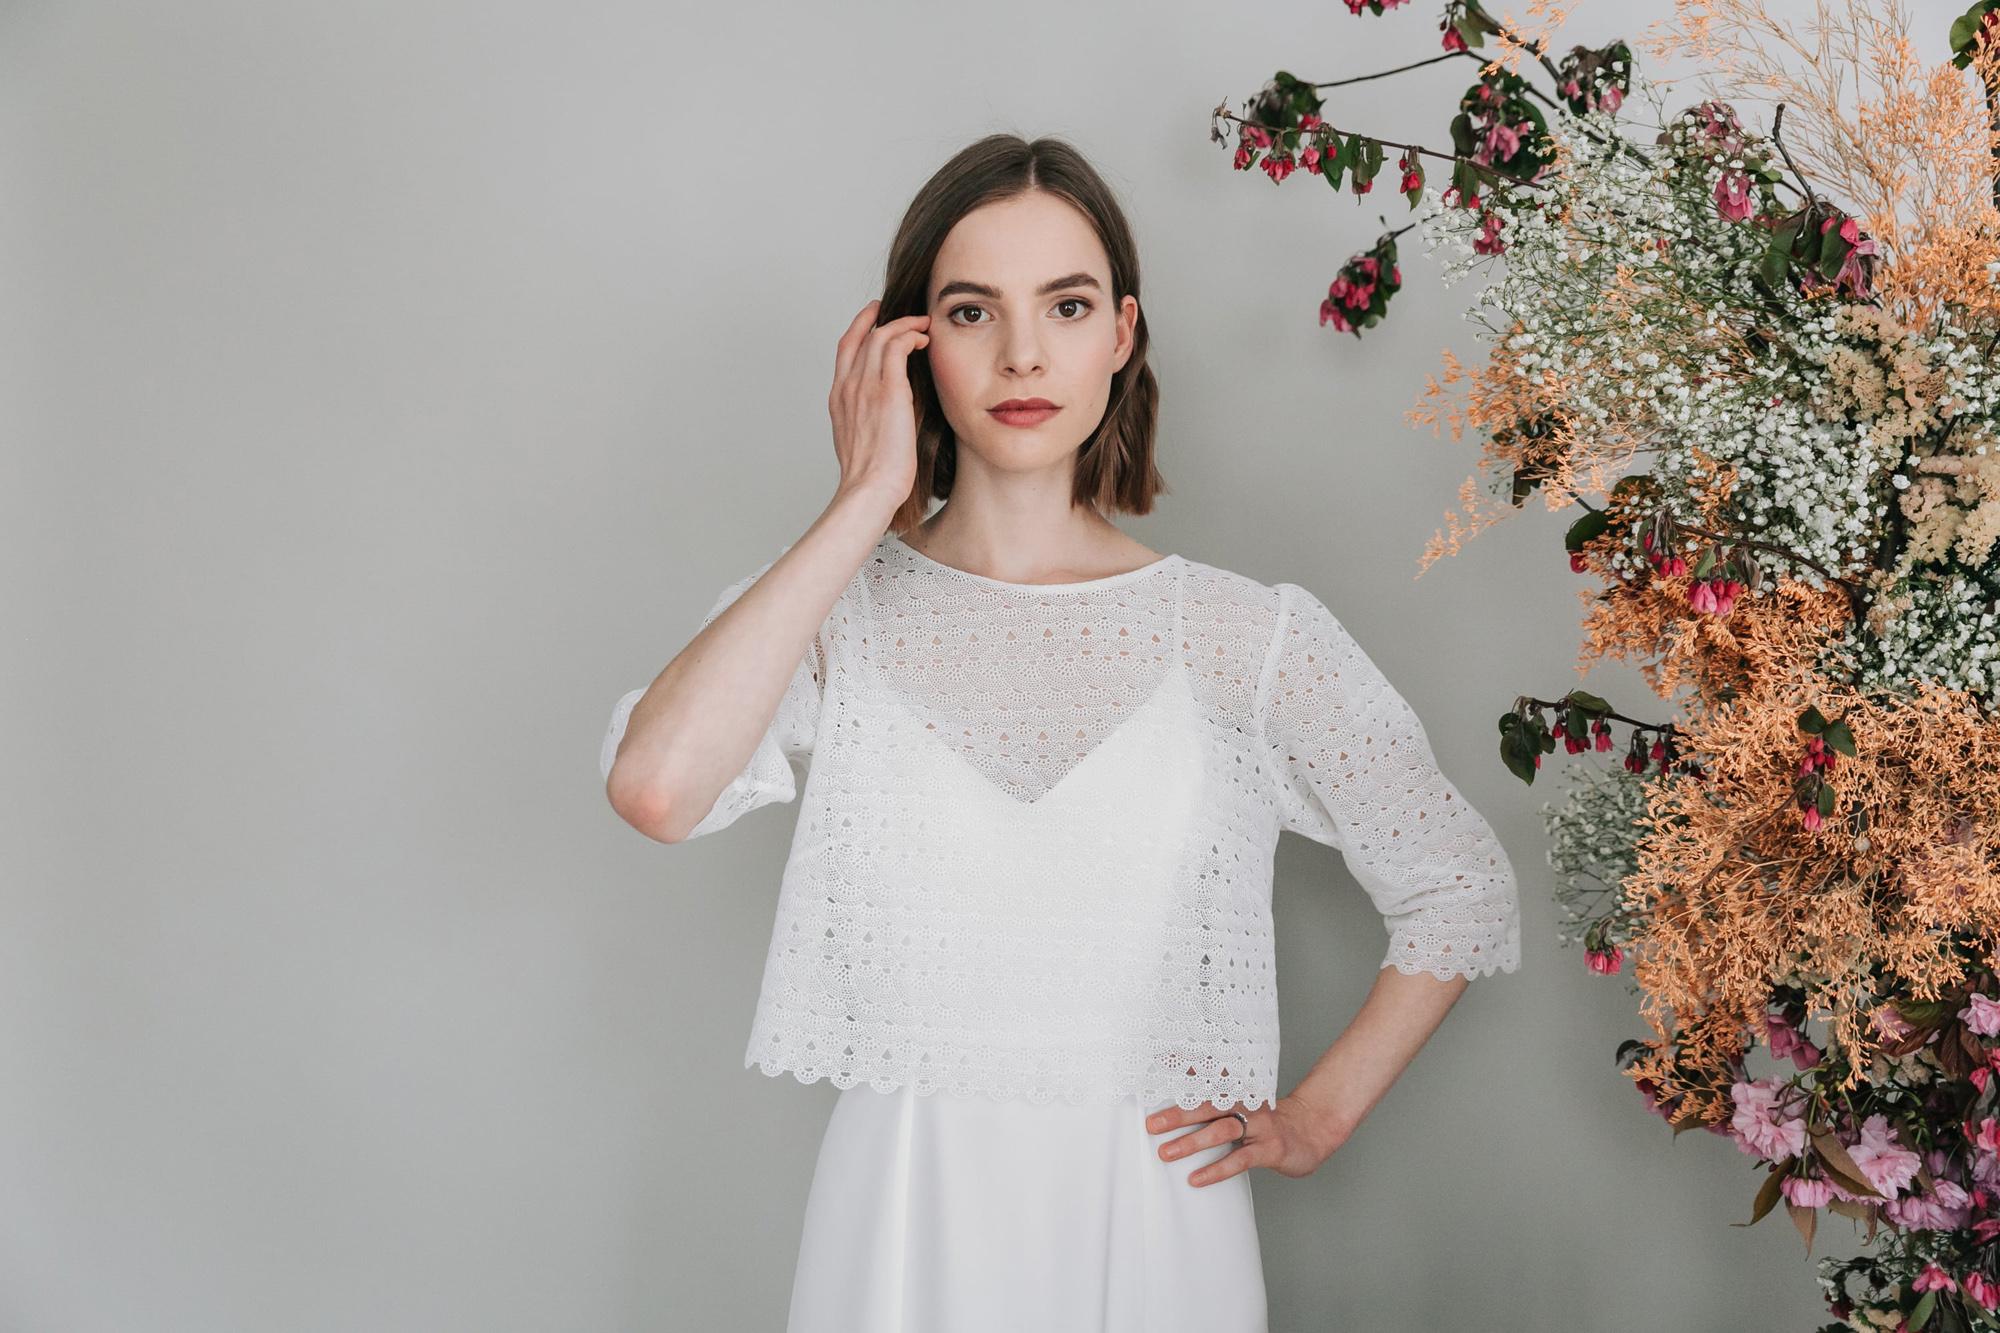 Kate-Beaumont-Sheffield-Freesia-Guipure-Lace-Jacket-Snowdrop-Minimal-Modern-Elegant-Matt-Silk-Wedding-Gown-3.jpg